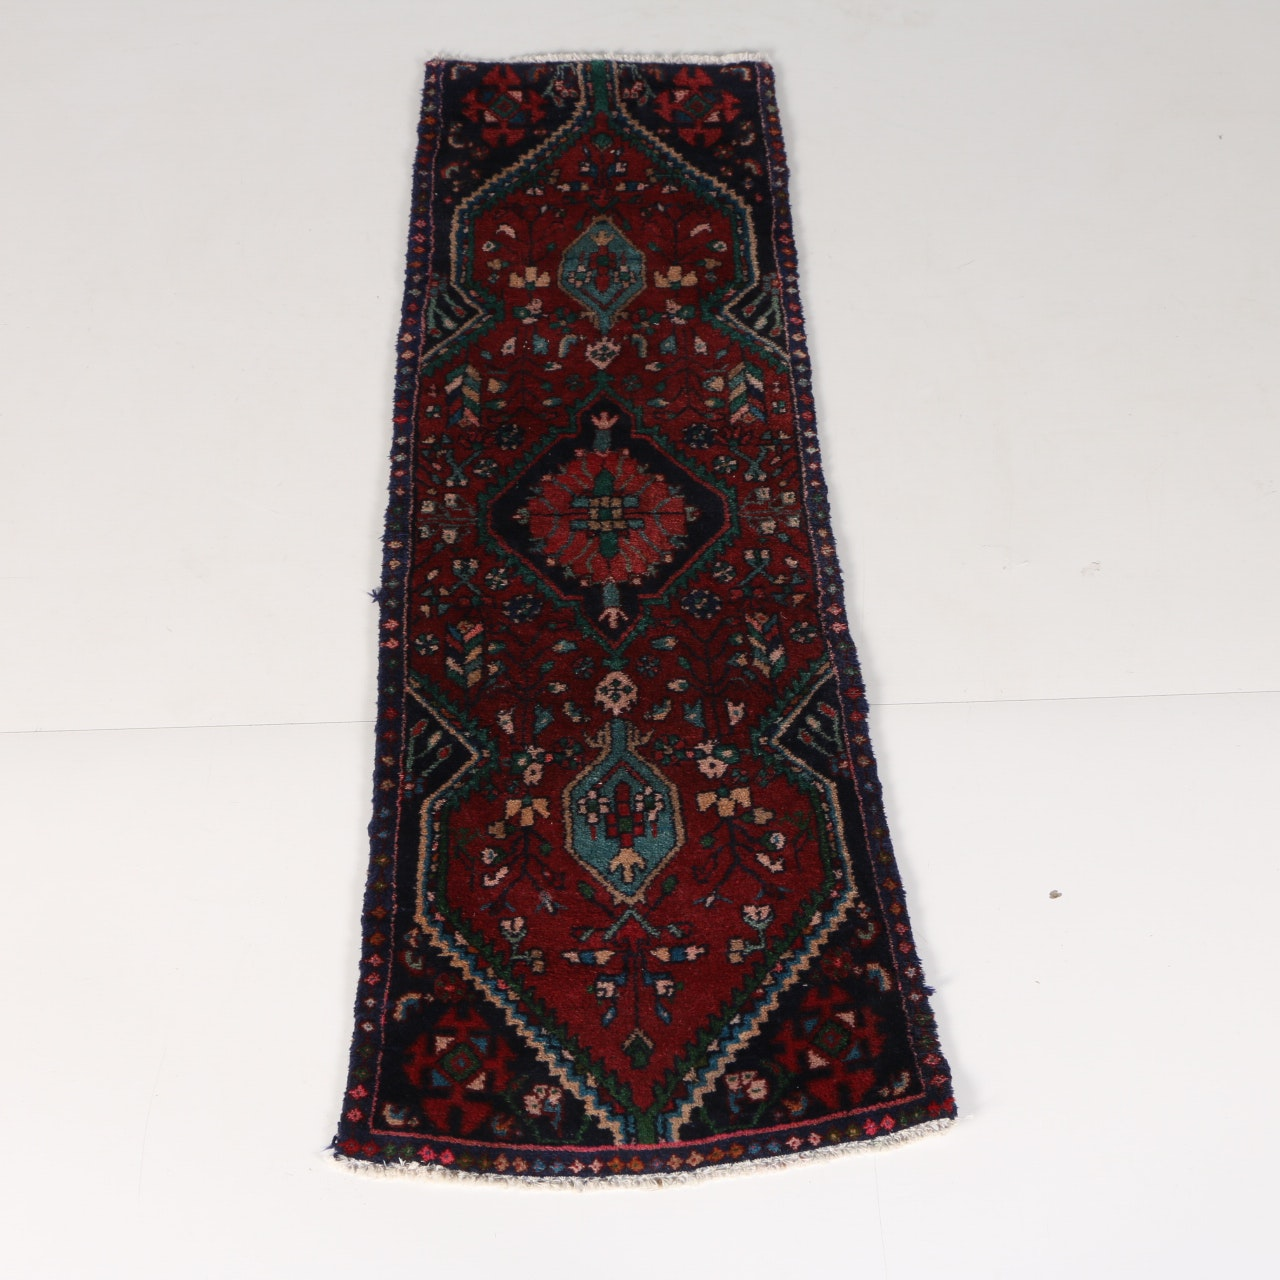 Vintage Hamden Handwoven Anatolian Runner Rug